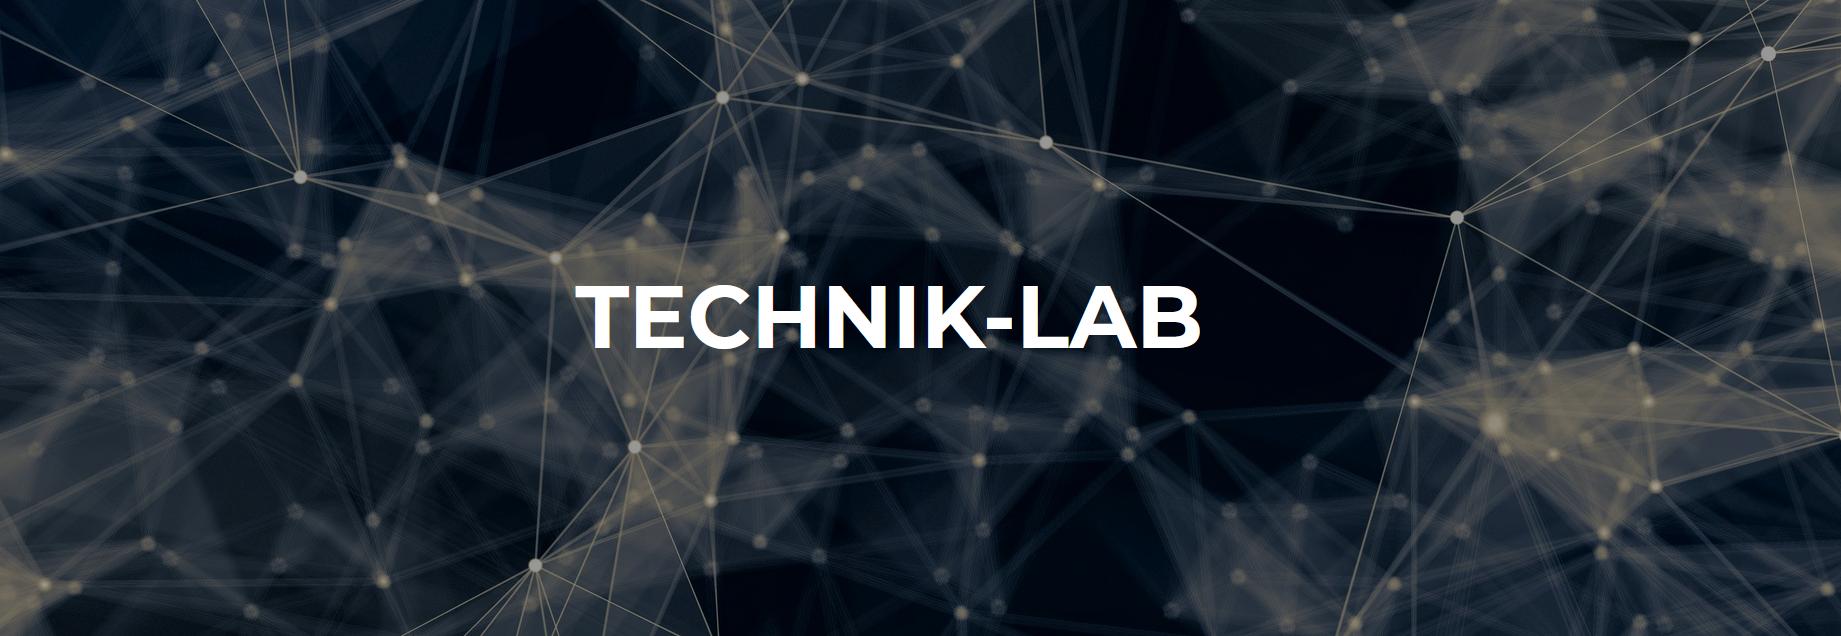 Technik Lab